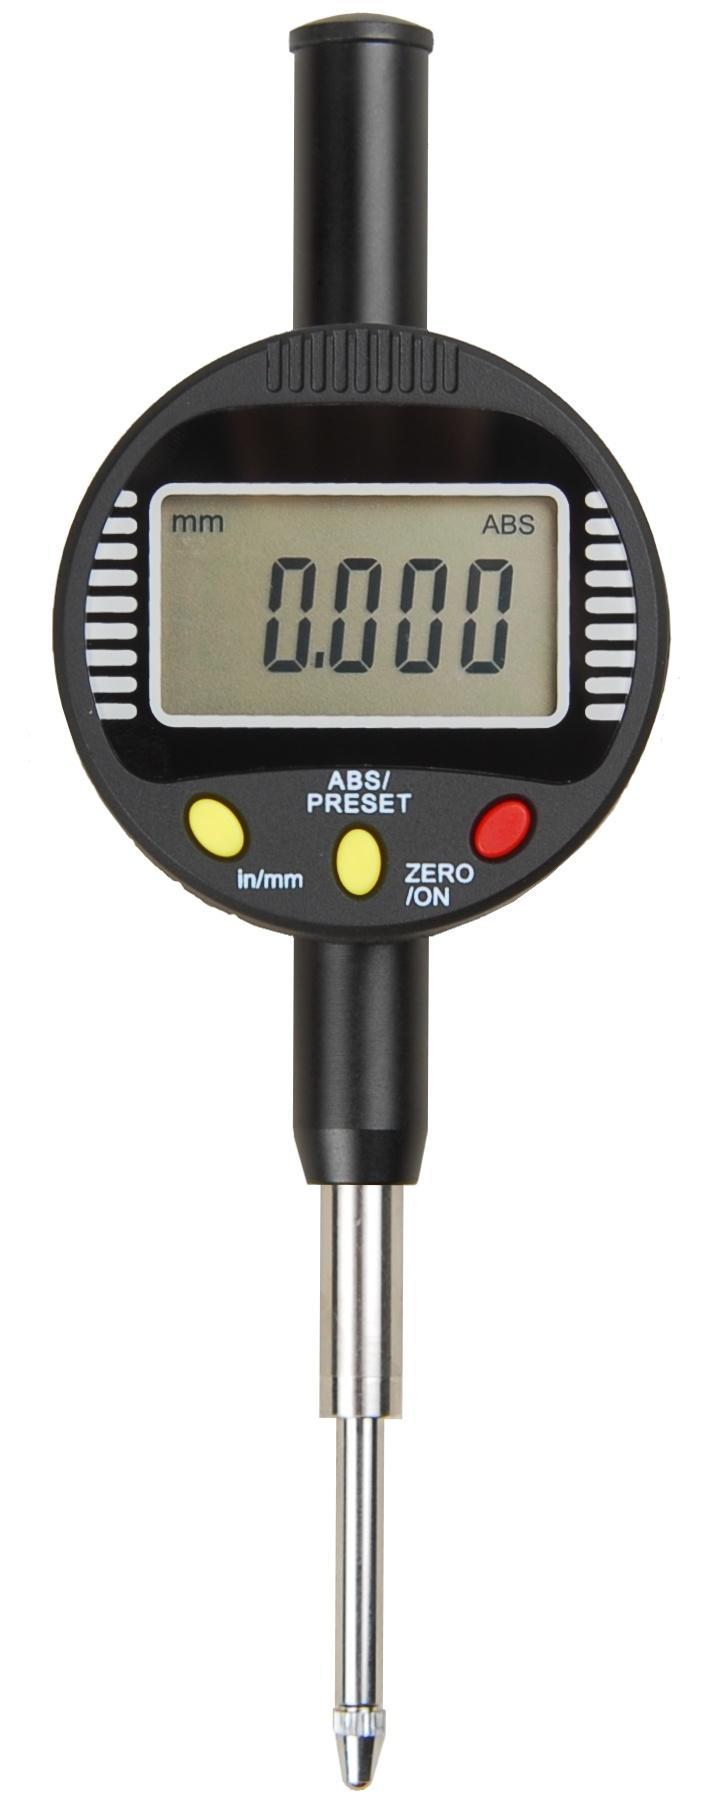 12.7mm Electronic Digital Micron Indicators Clocks Resolution 0.001 Dial Indicators